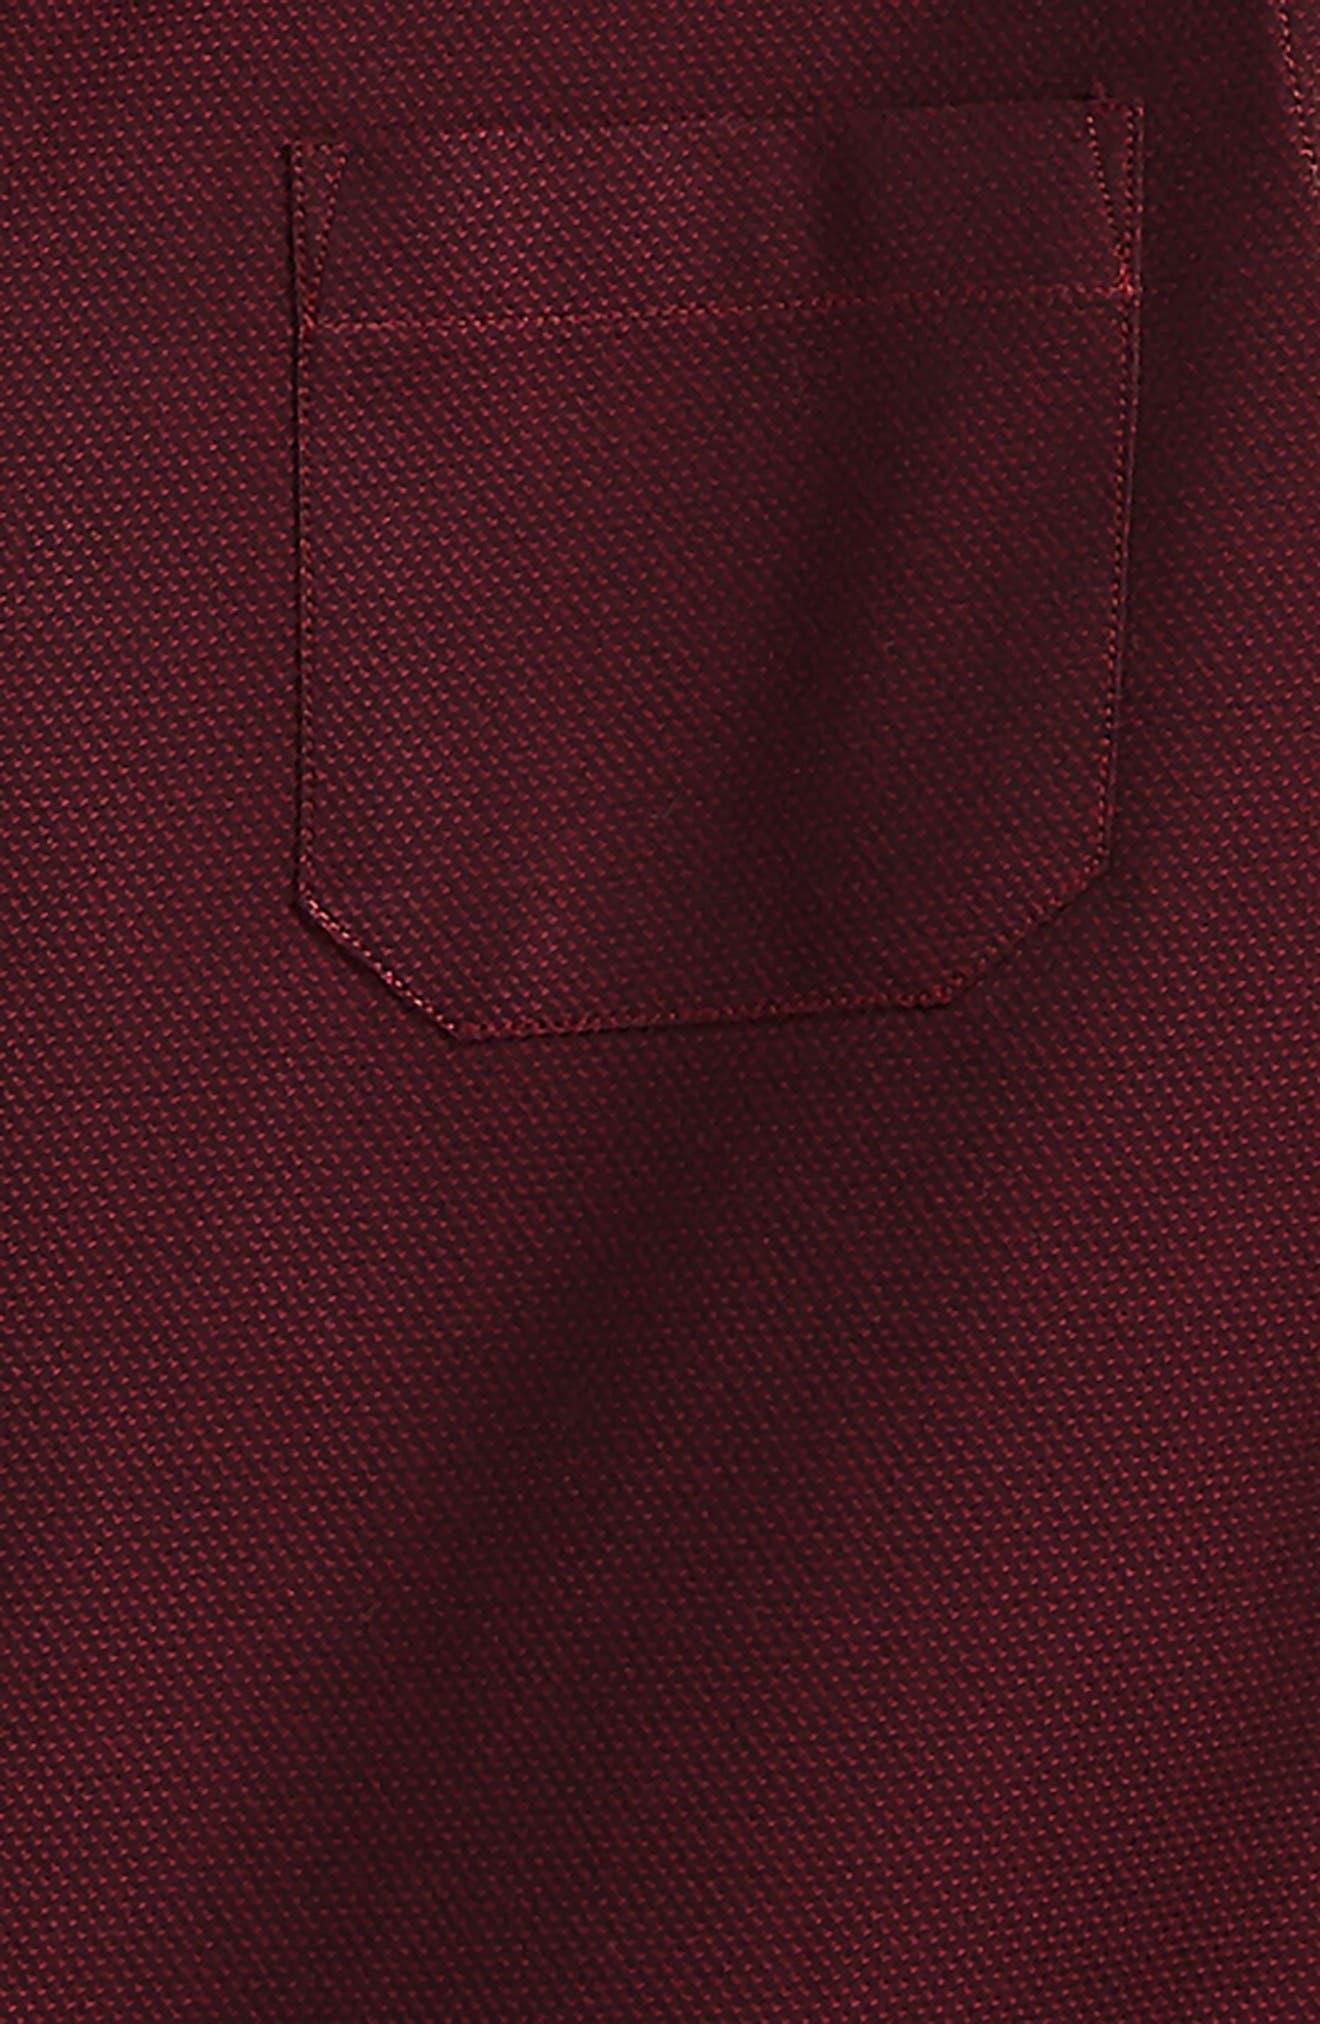 Alternate Image 2  - Report Collection Textured Dress Shirt (Big Boys)